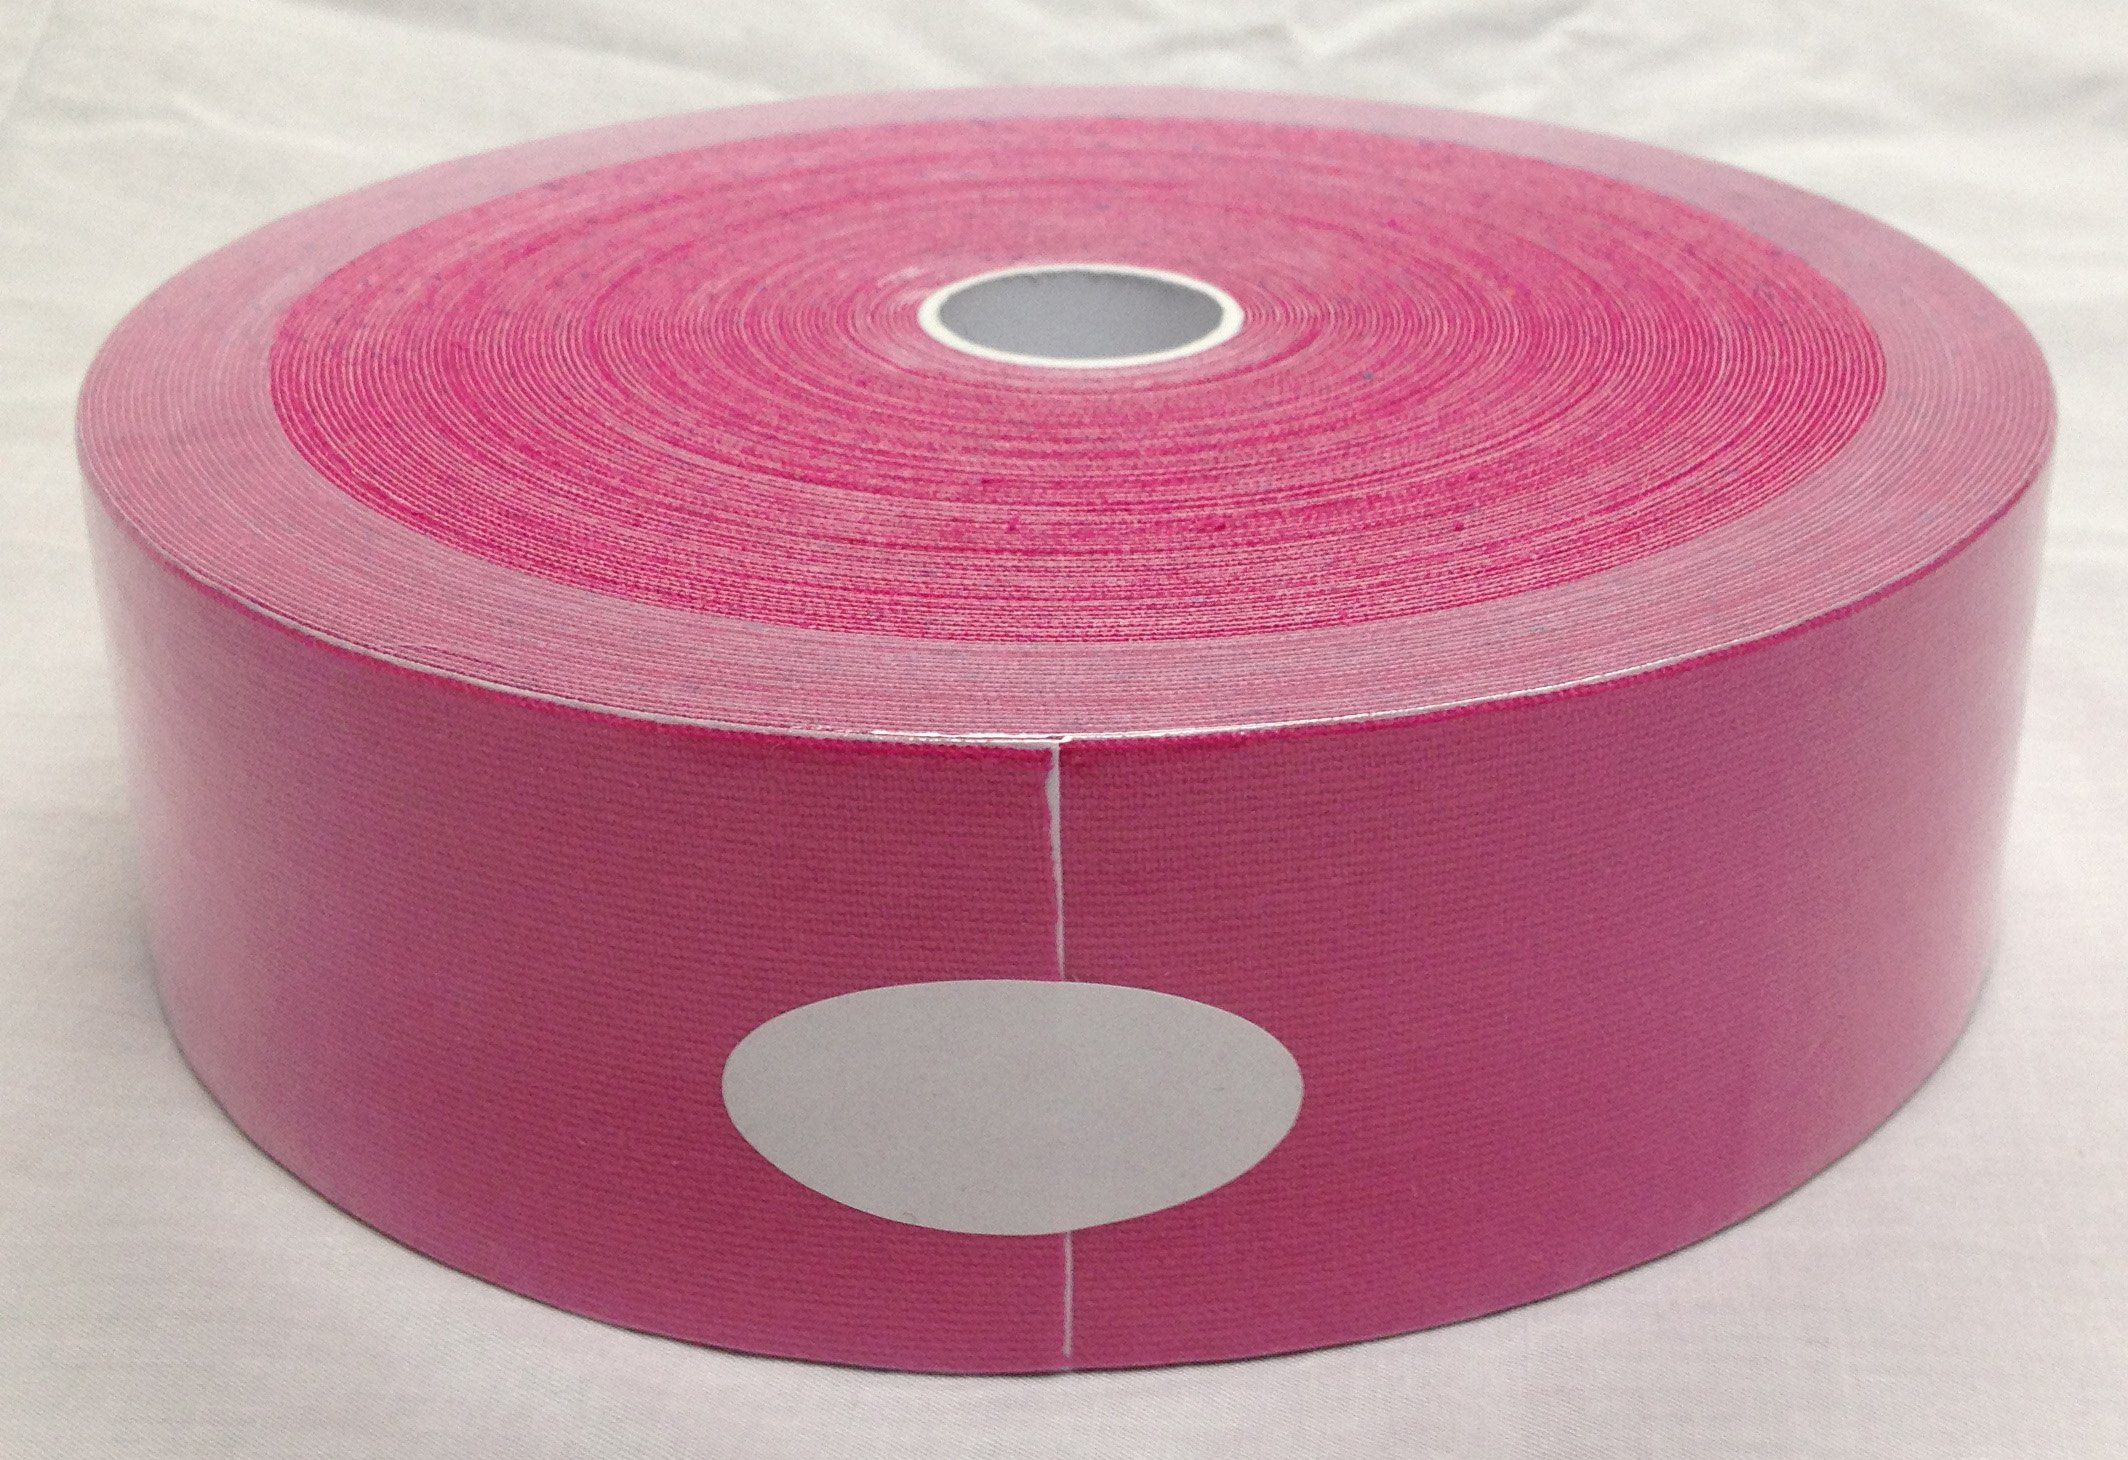 Therapist's Choice® Kinesiology Tape Bulk Roll (2-Inch x 105-Feet) (Pink)